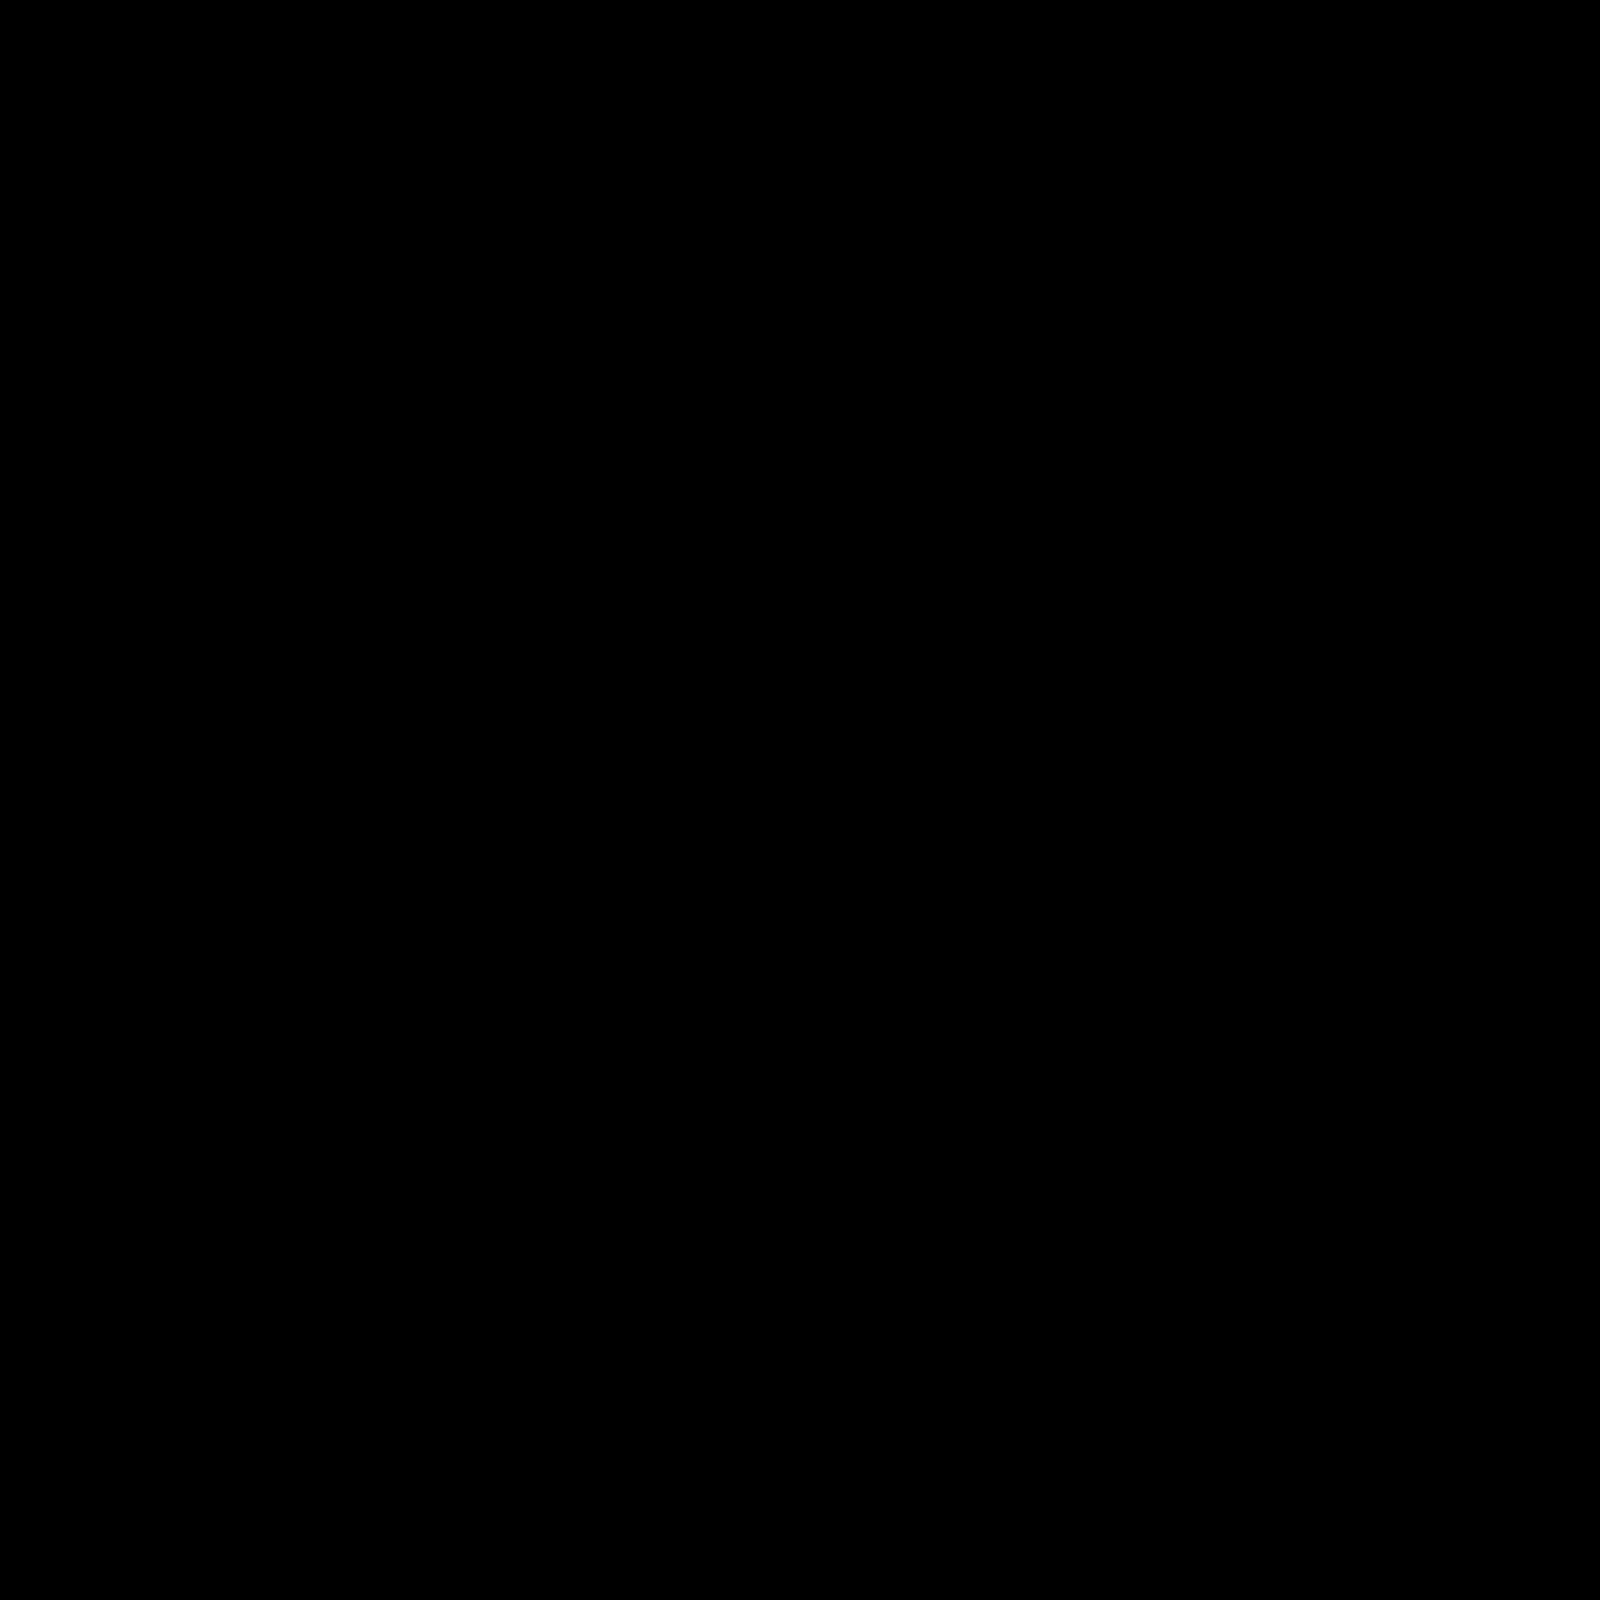 2006 icon